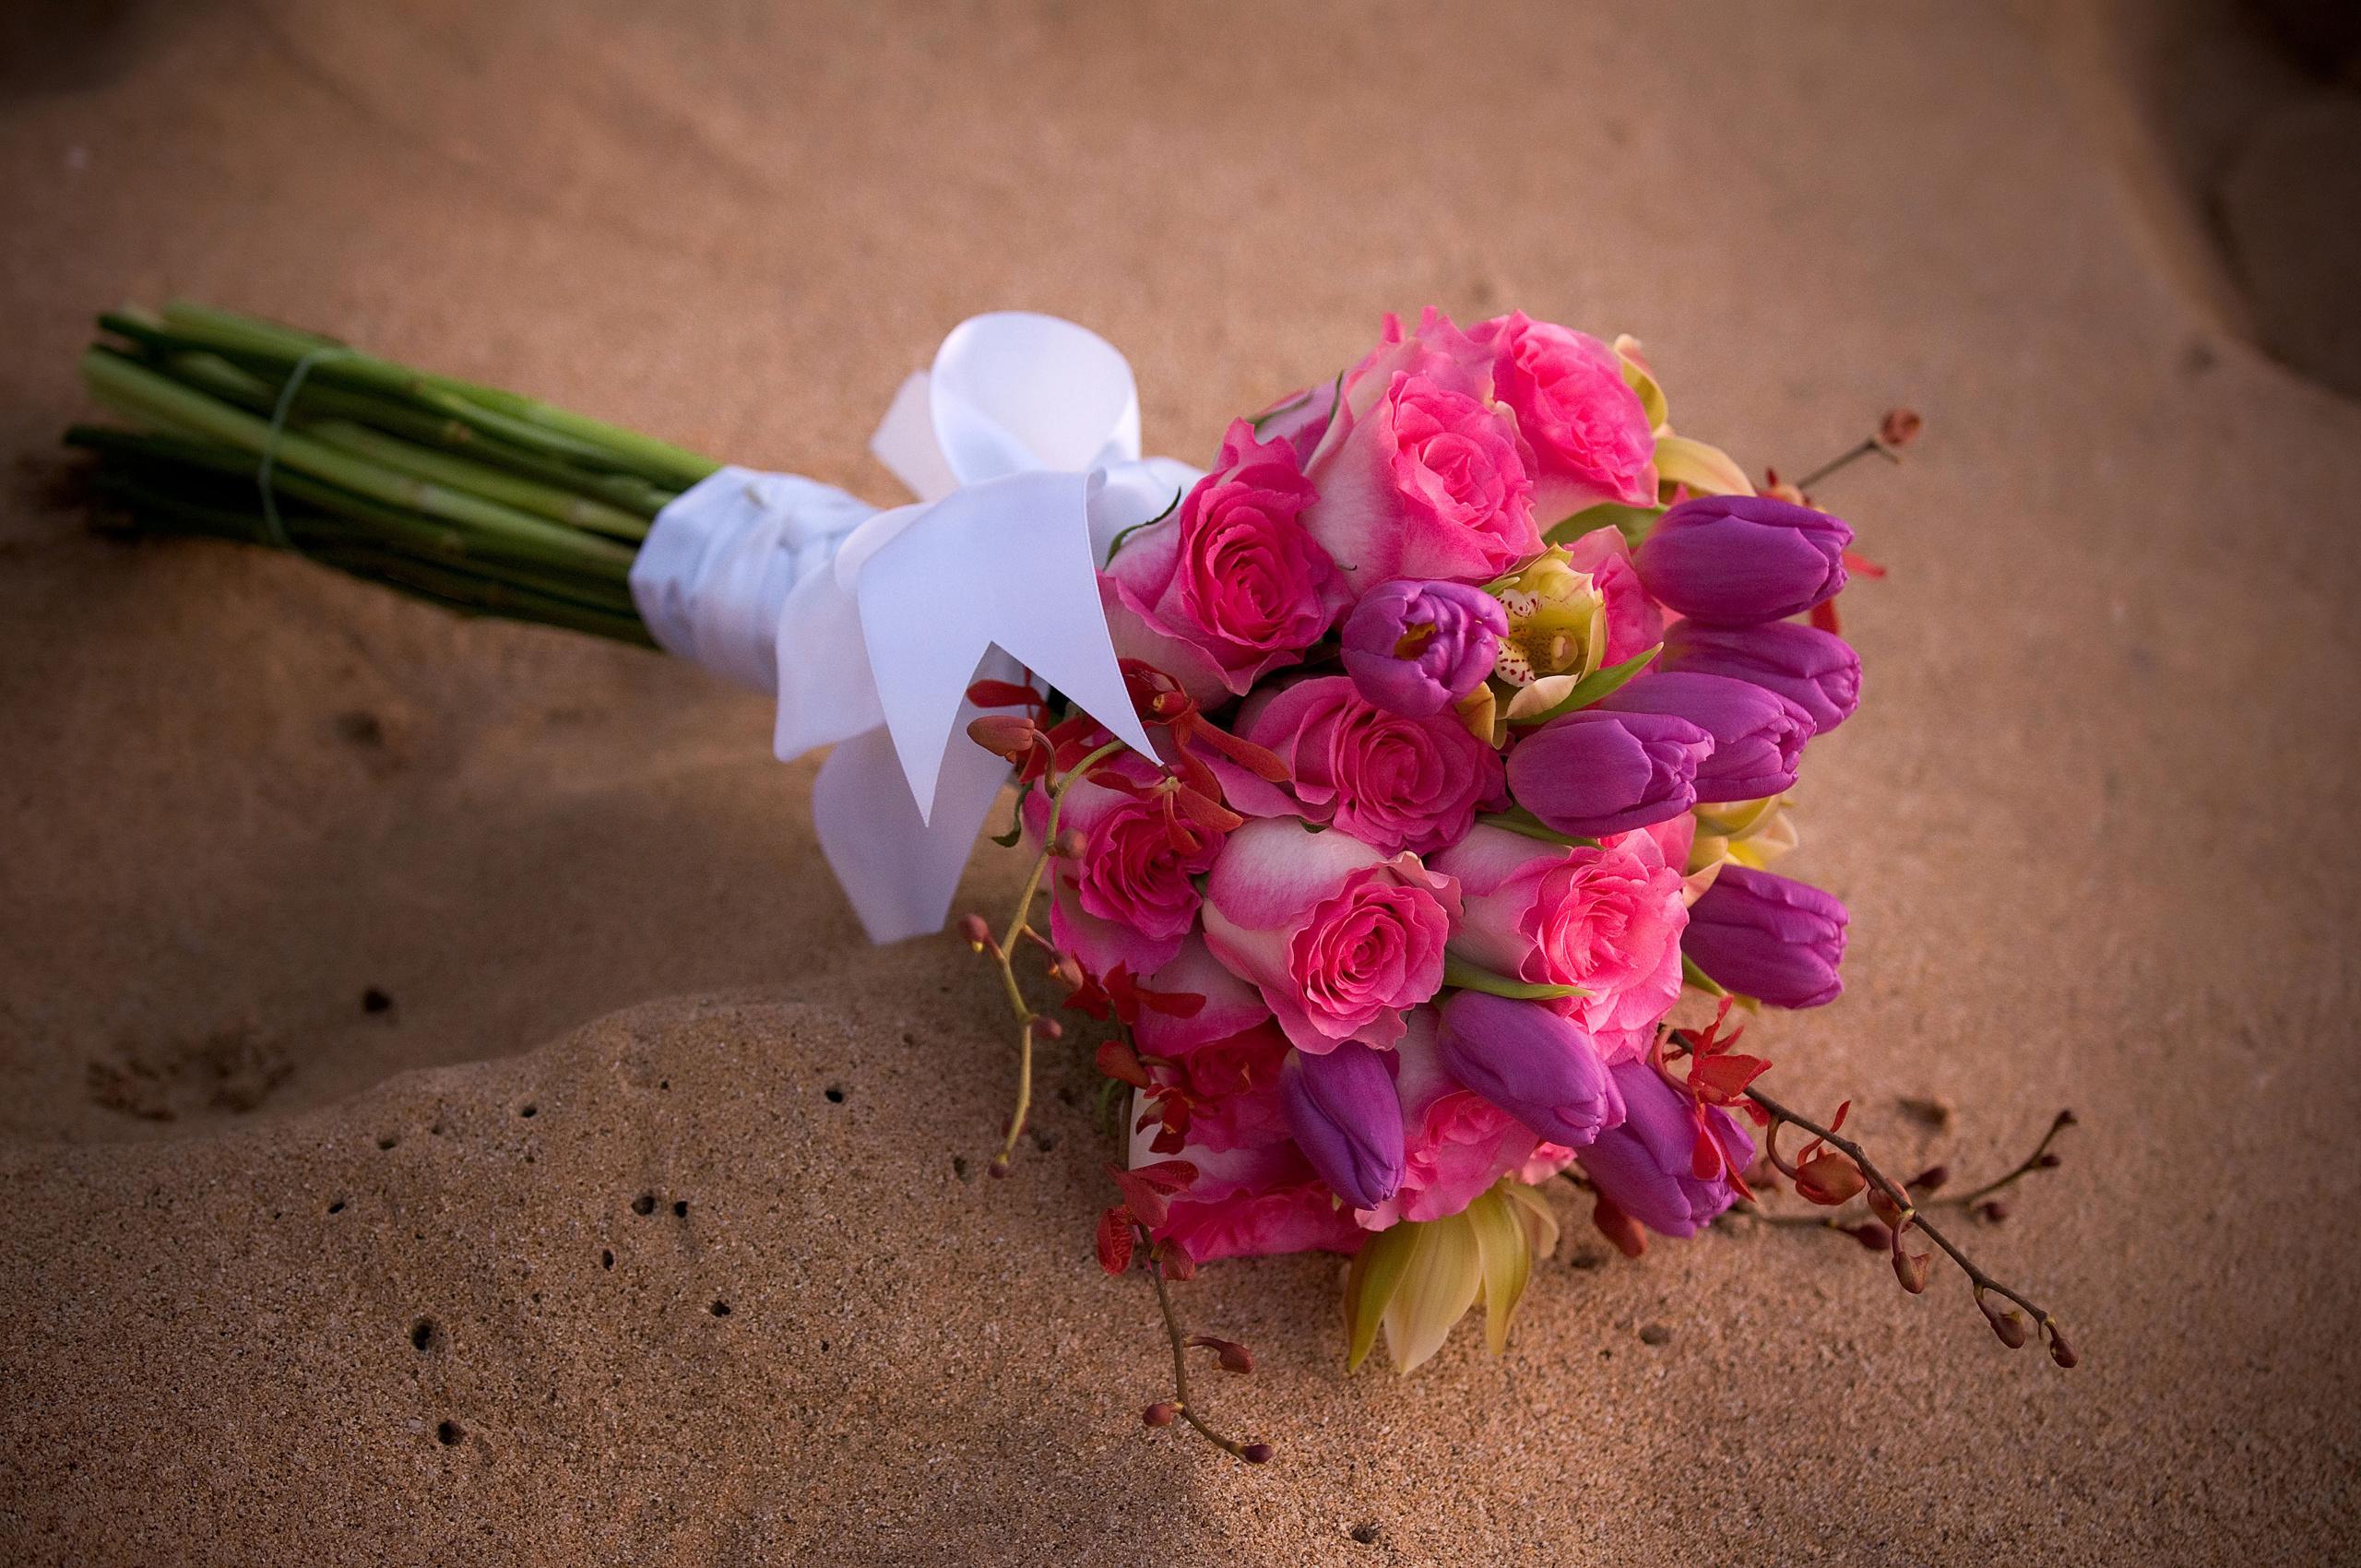 Картинки букет роза Орхидеи тюльпан Цветы 2560x1700 Букеты Розы орхидея Тюльпаны цветок